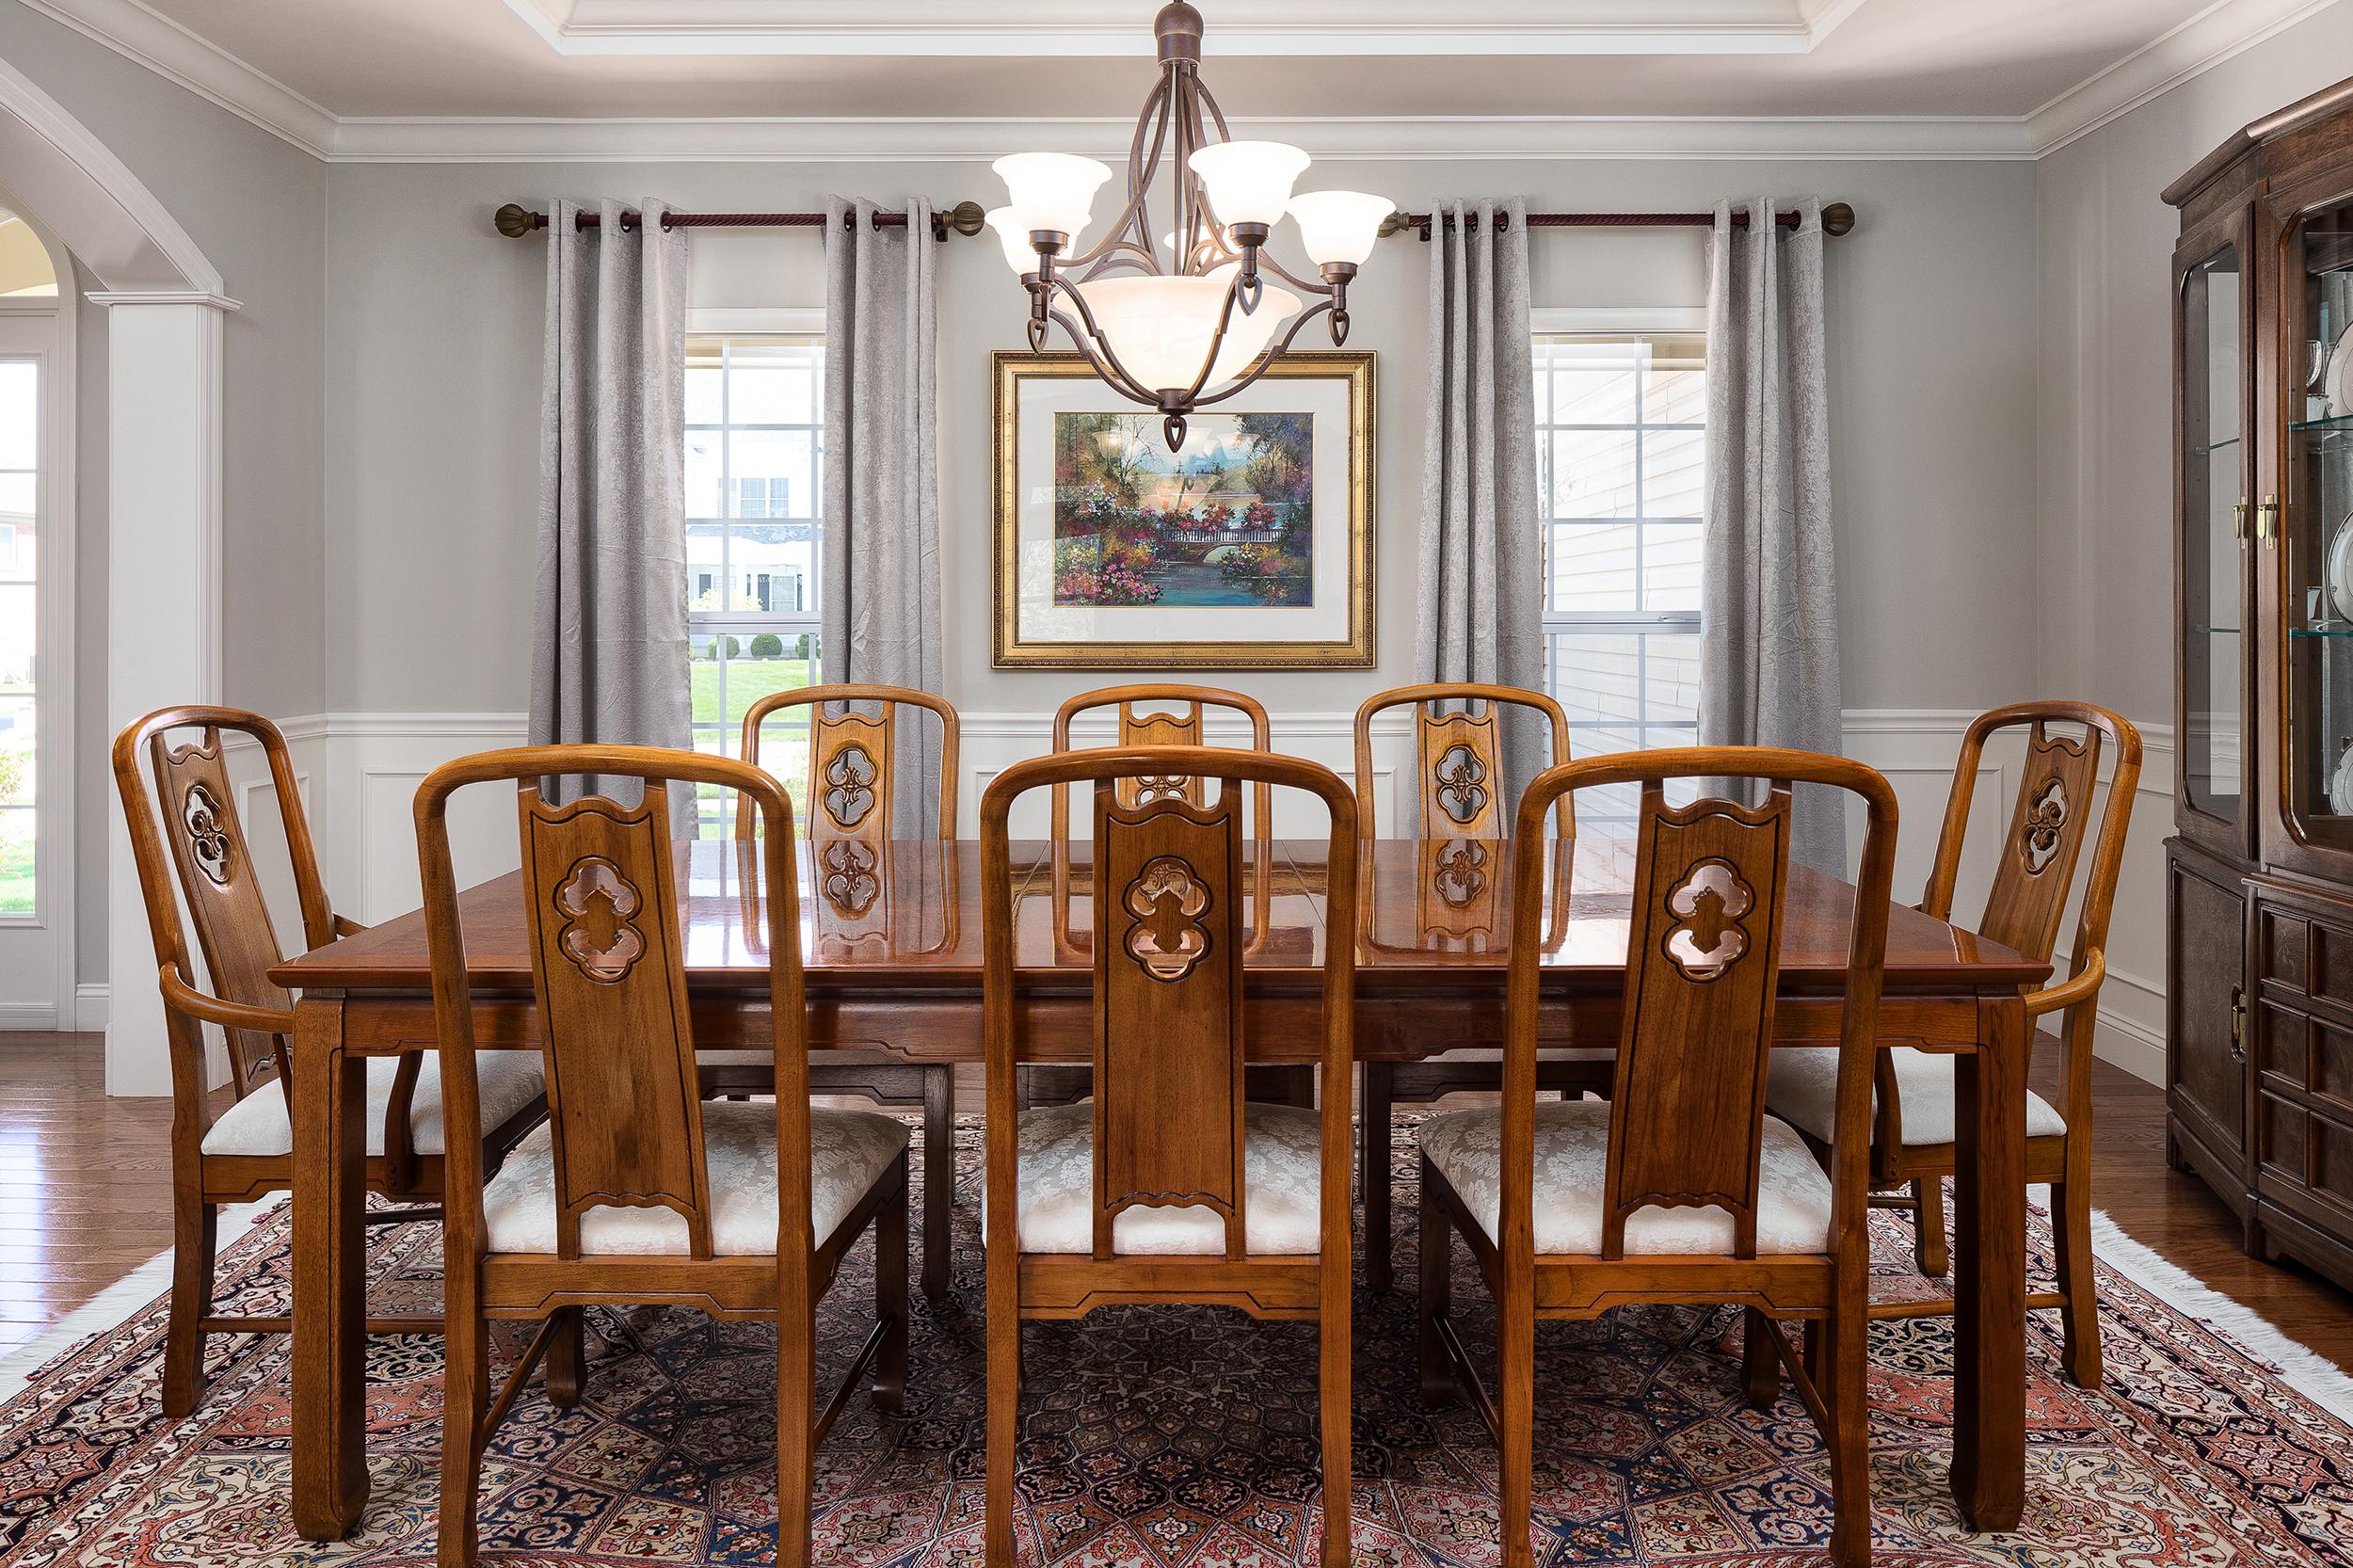 dining-room-table-9356-white-avenue-brentwood-mo-63144-jason-lusk-2017-portfolio.jpg